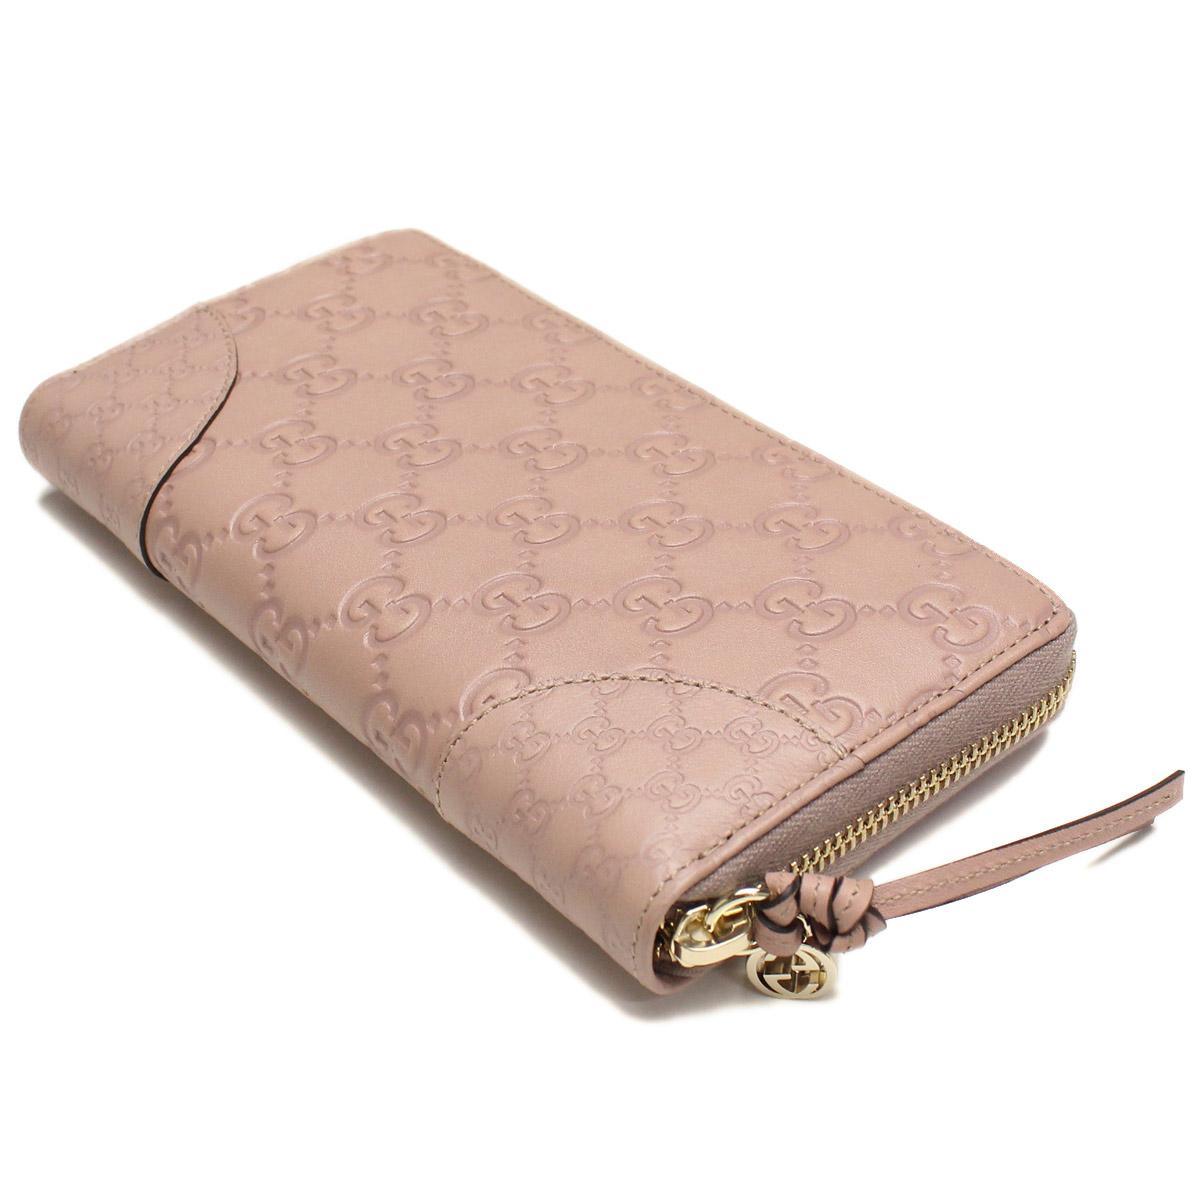 5441ec15477059 Bighit The total brand wholesale  Gucci (GUCCI) BREE long wallet ...